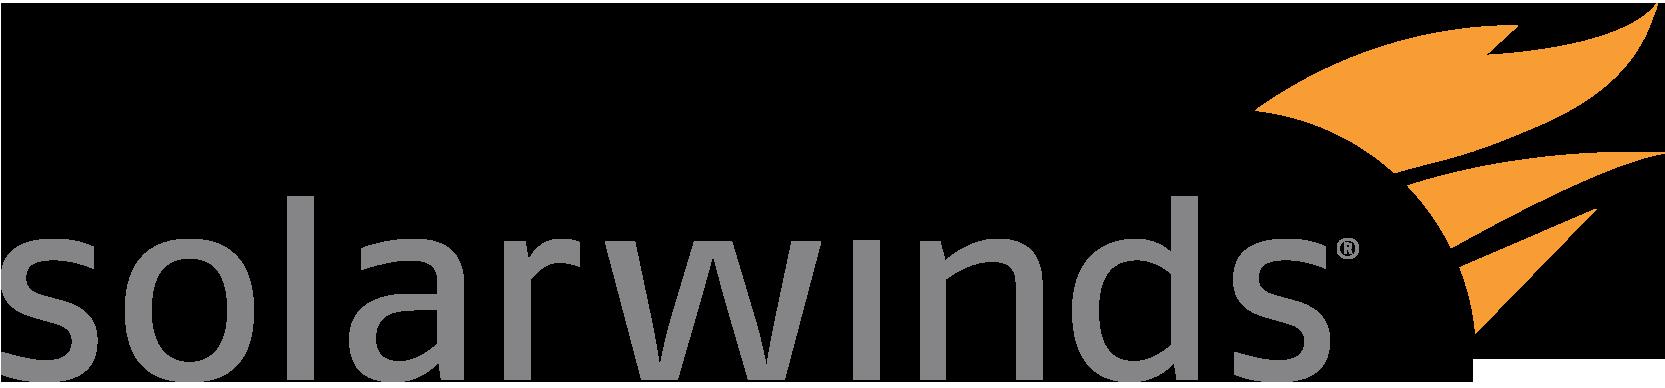 SolarWinds Server & Application Monitor logo